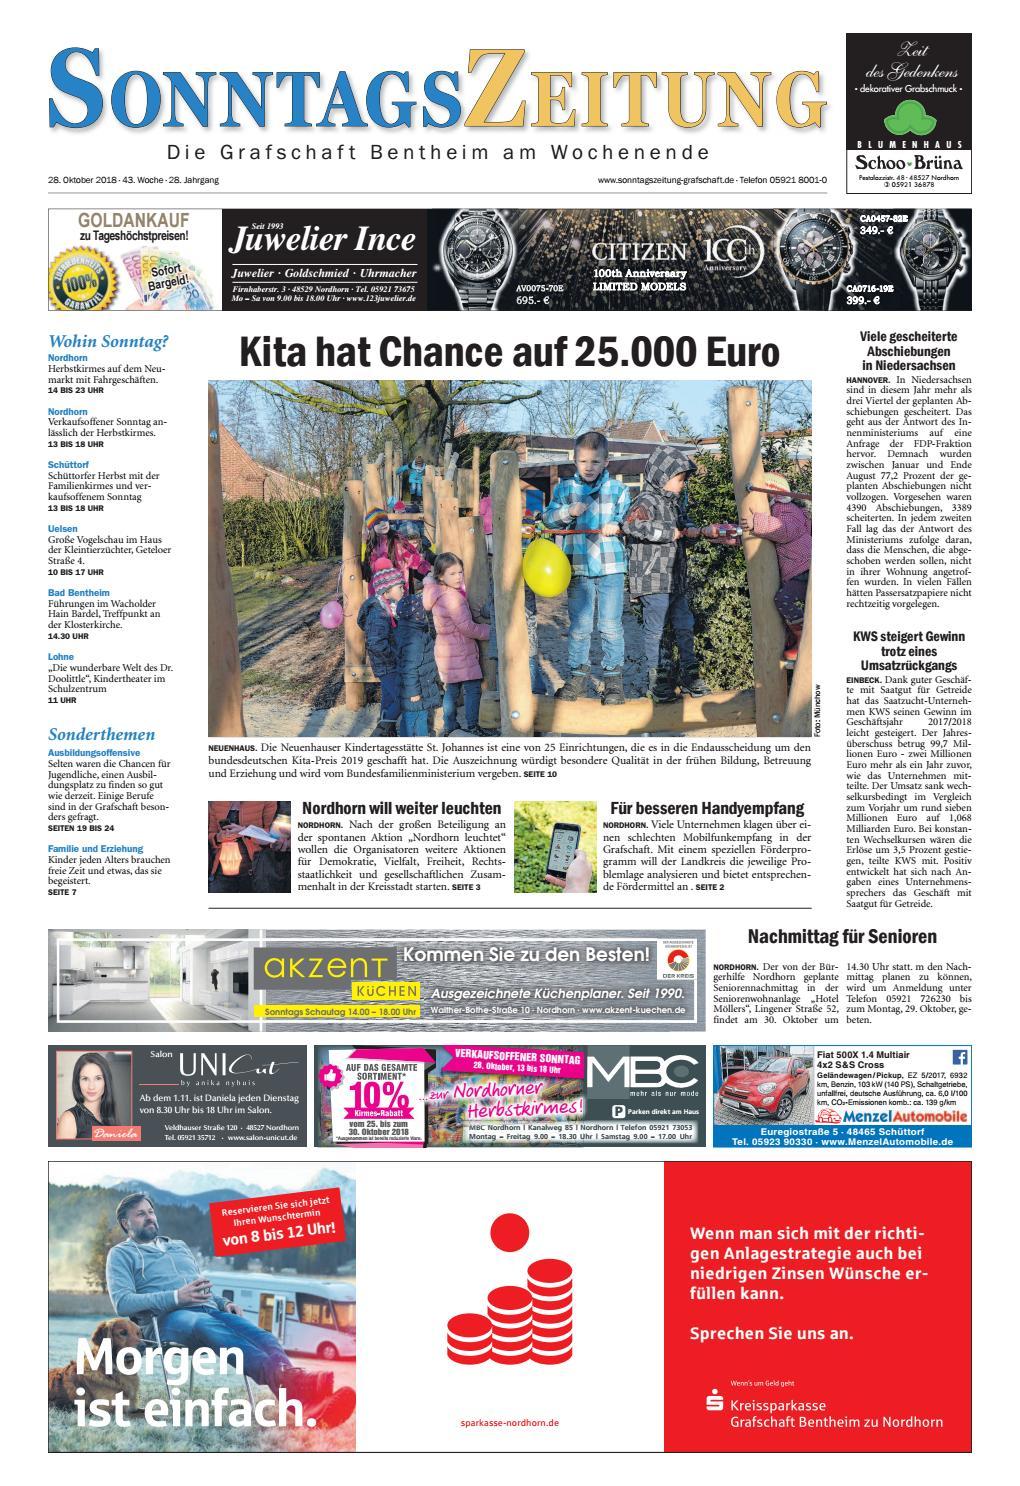 sonntagszeitung 28 10 2018 by